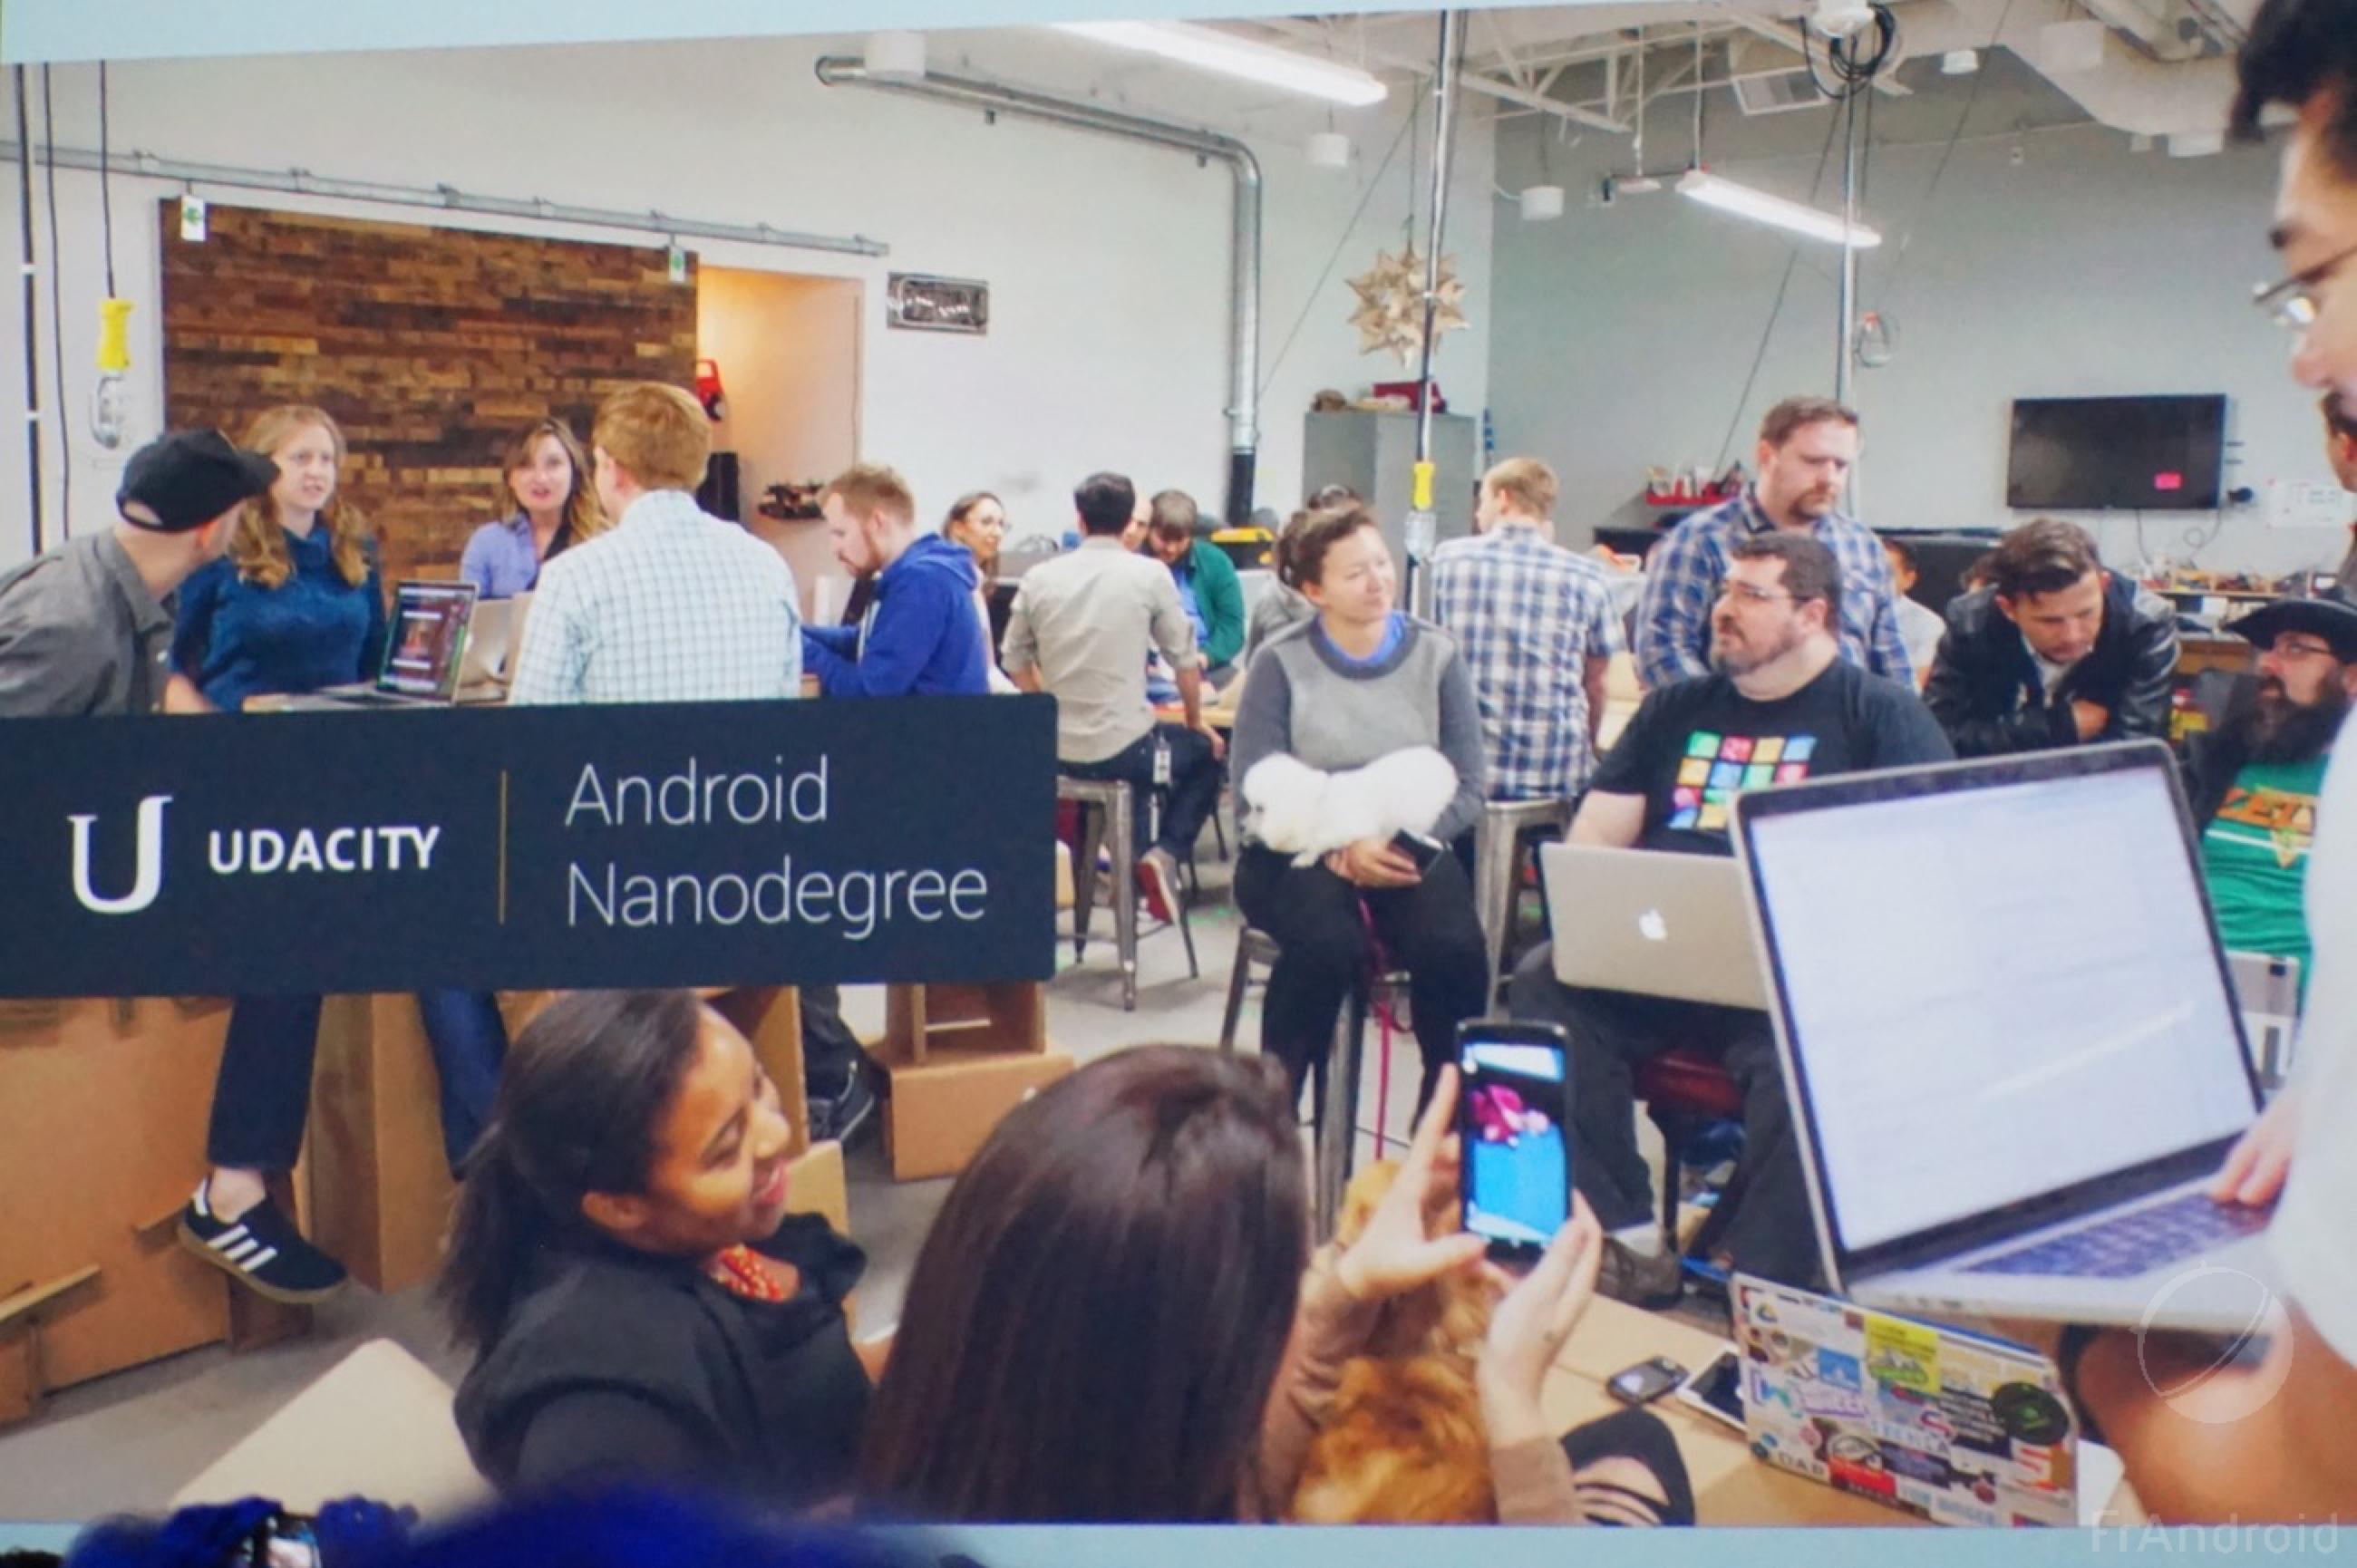 Google va former des développeurs Android sur Udacity